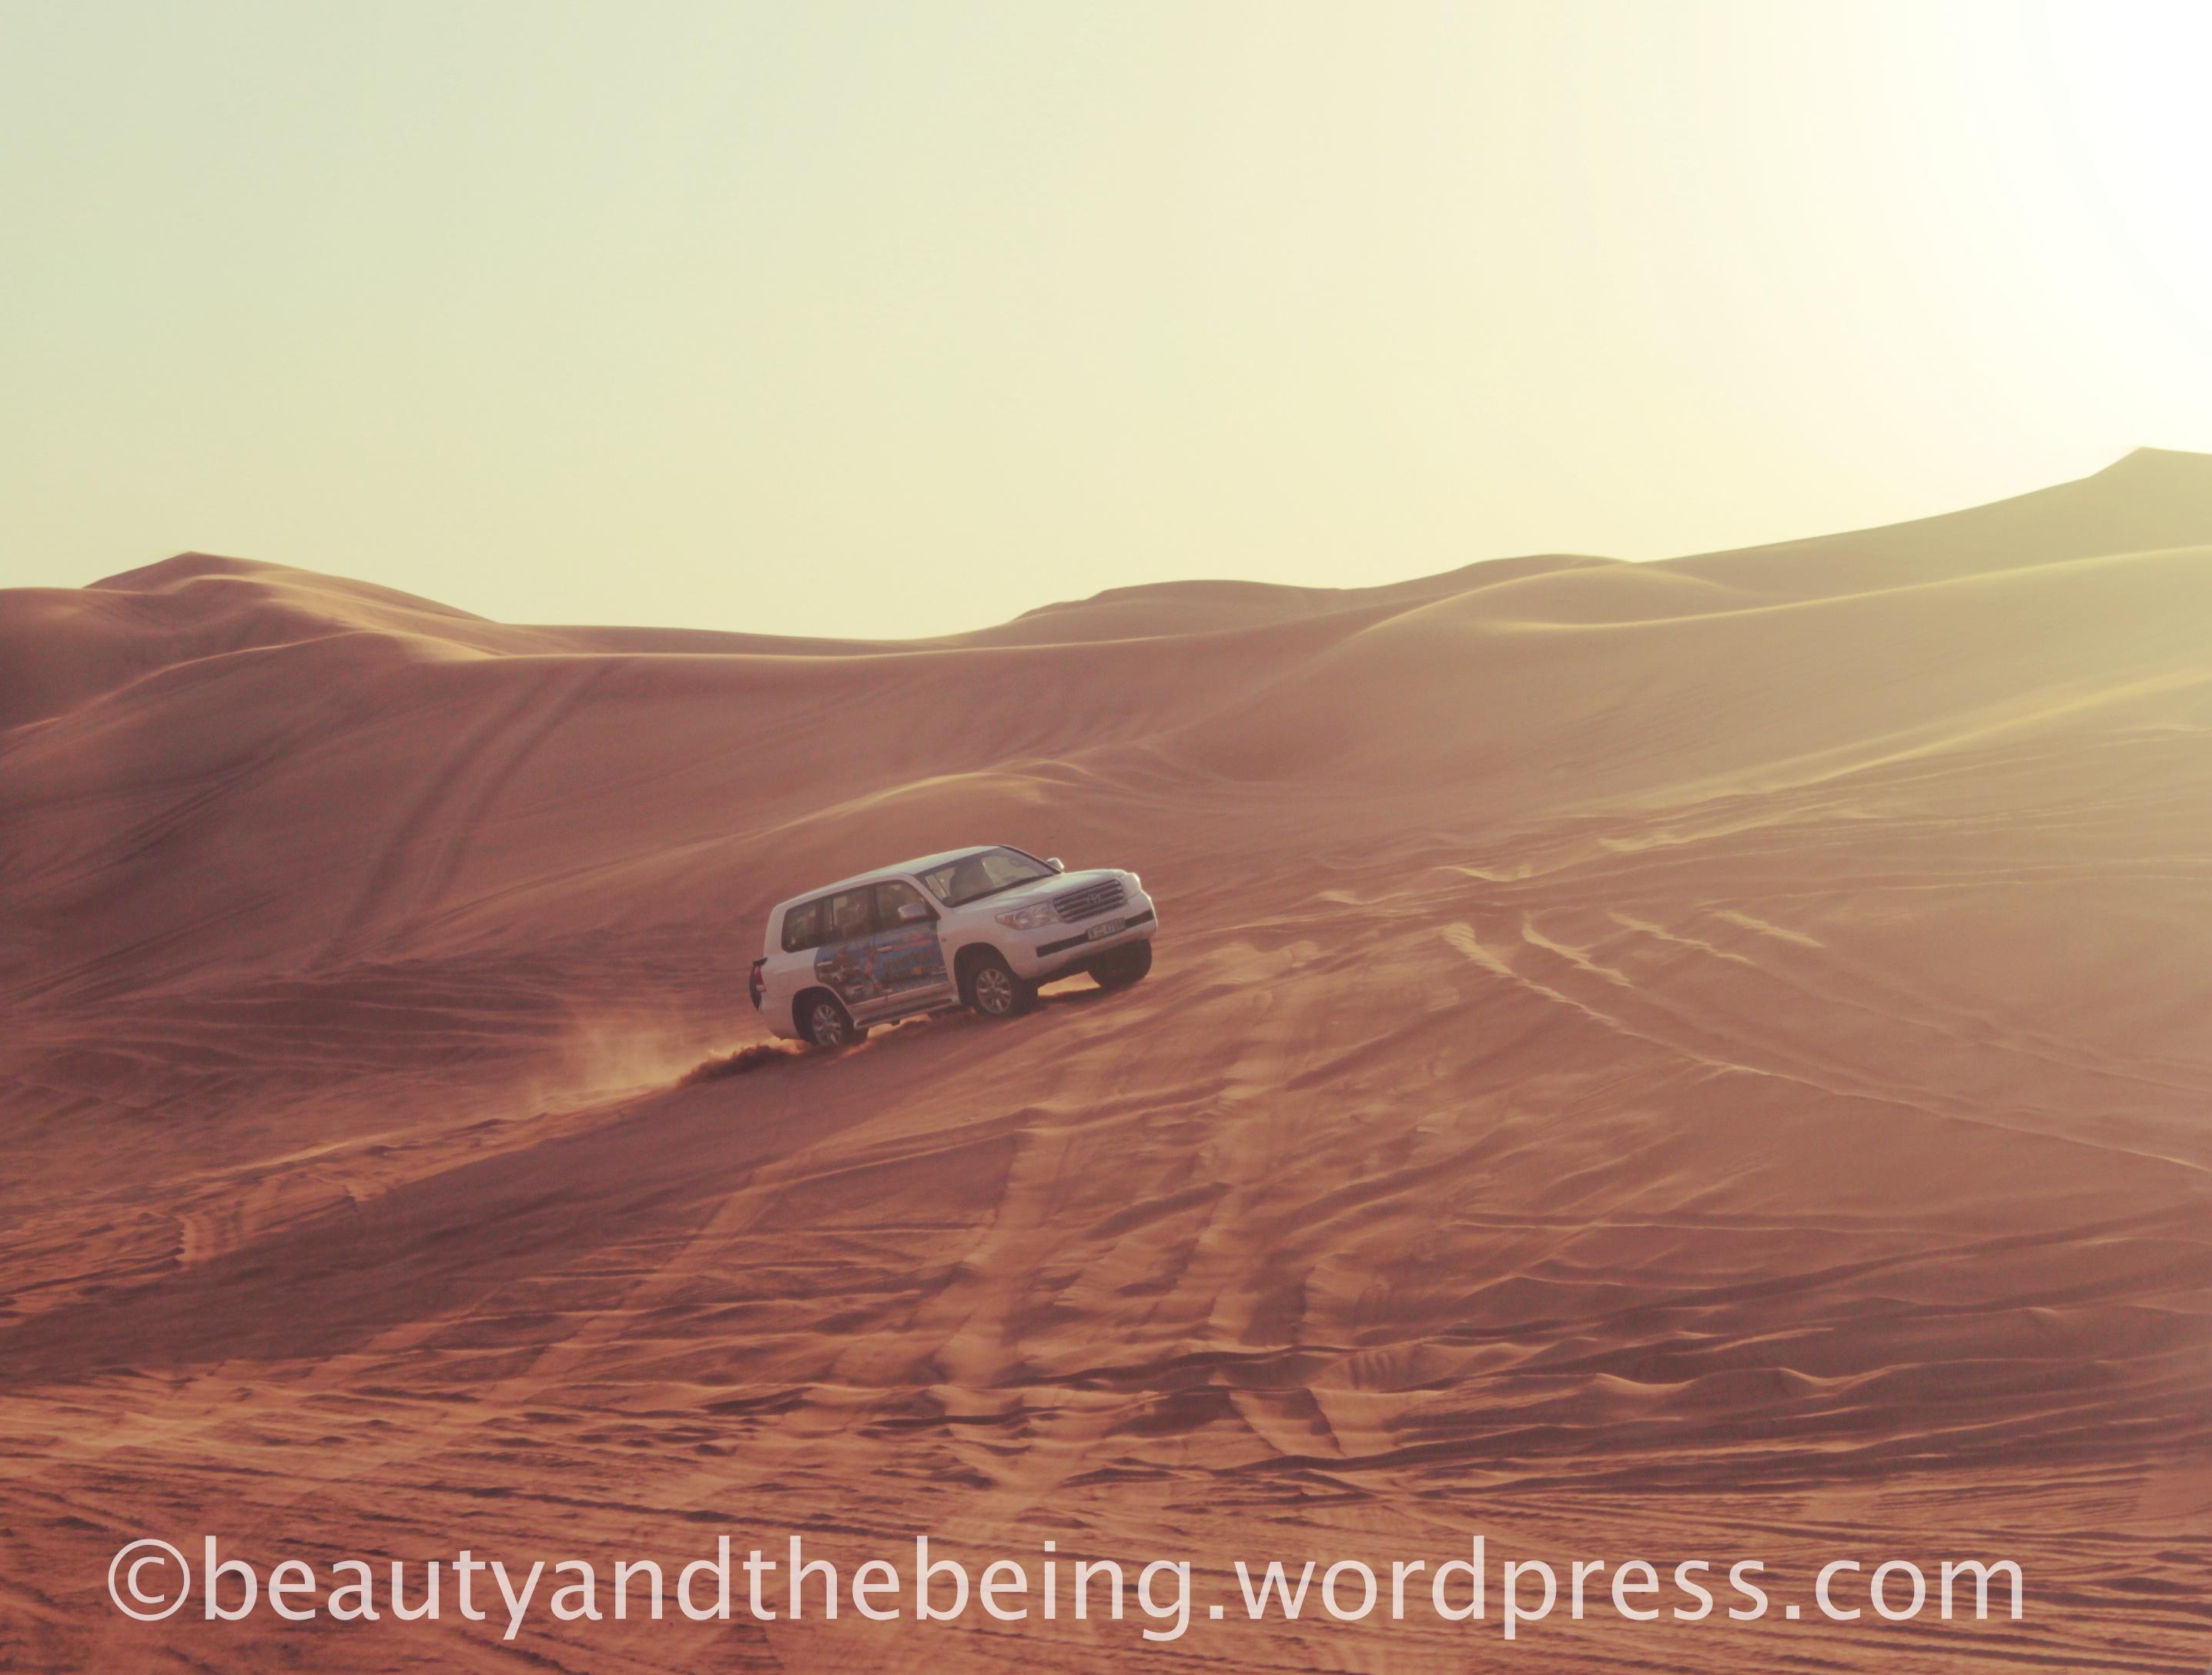 Dune Bashing with Funtours Dubai